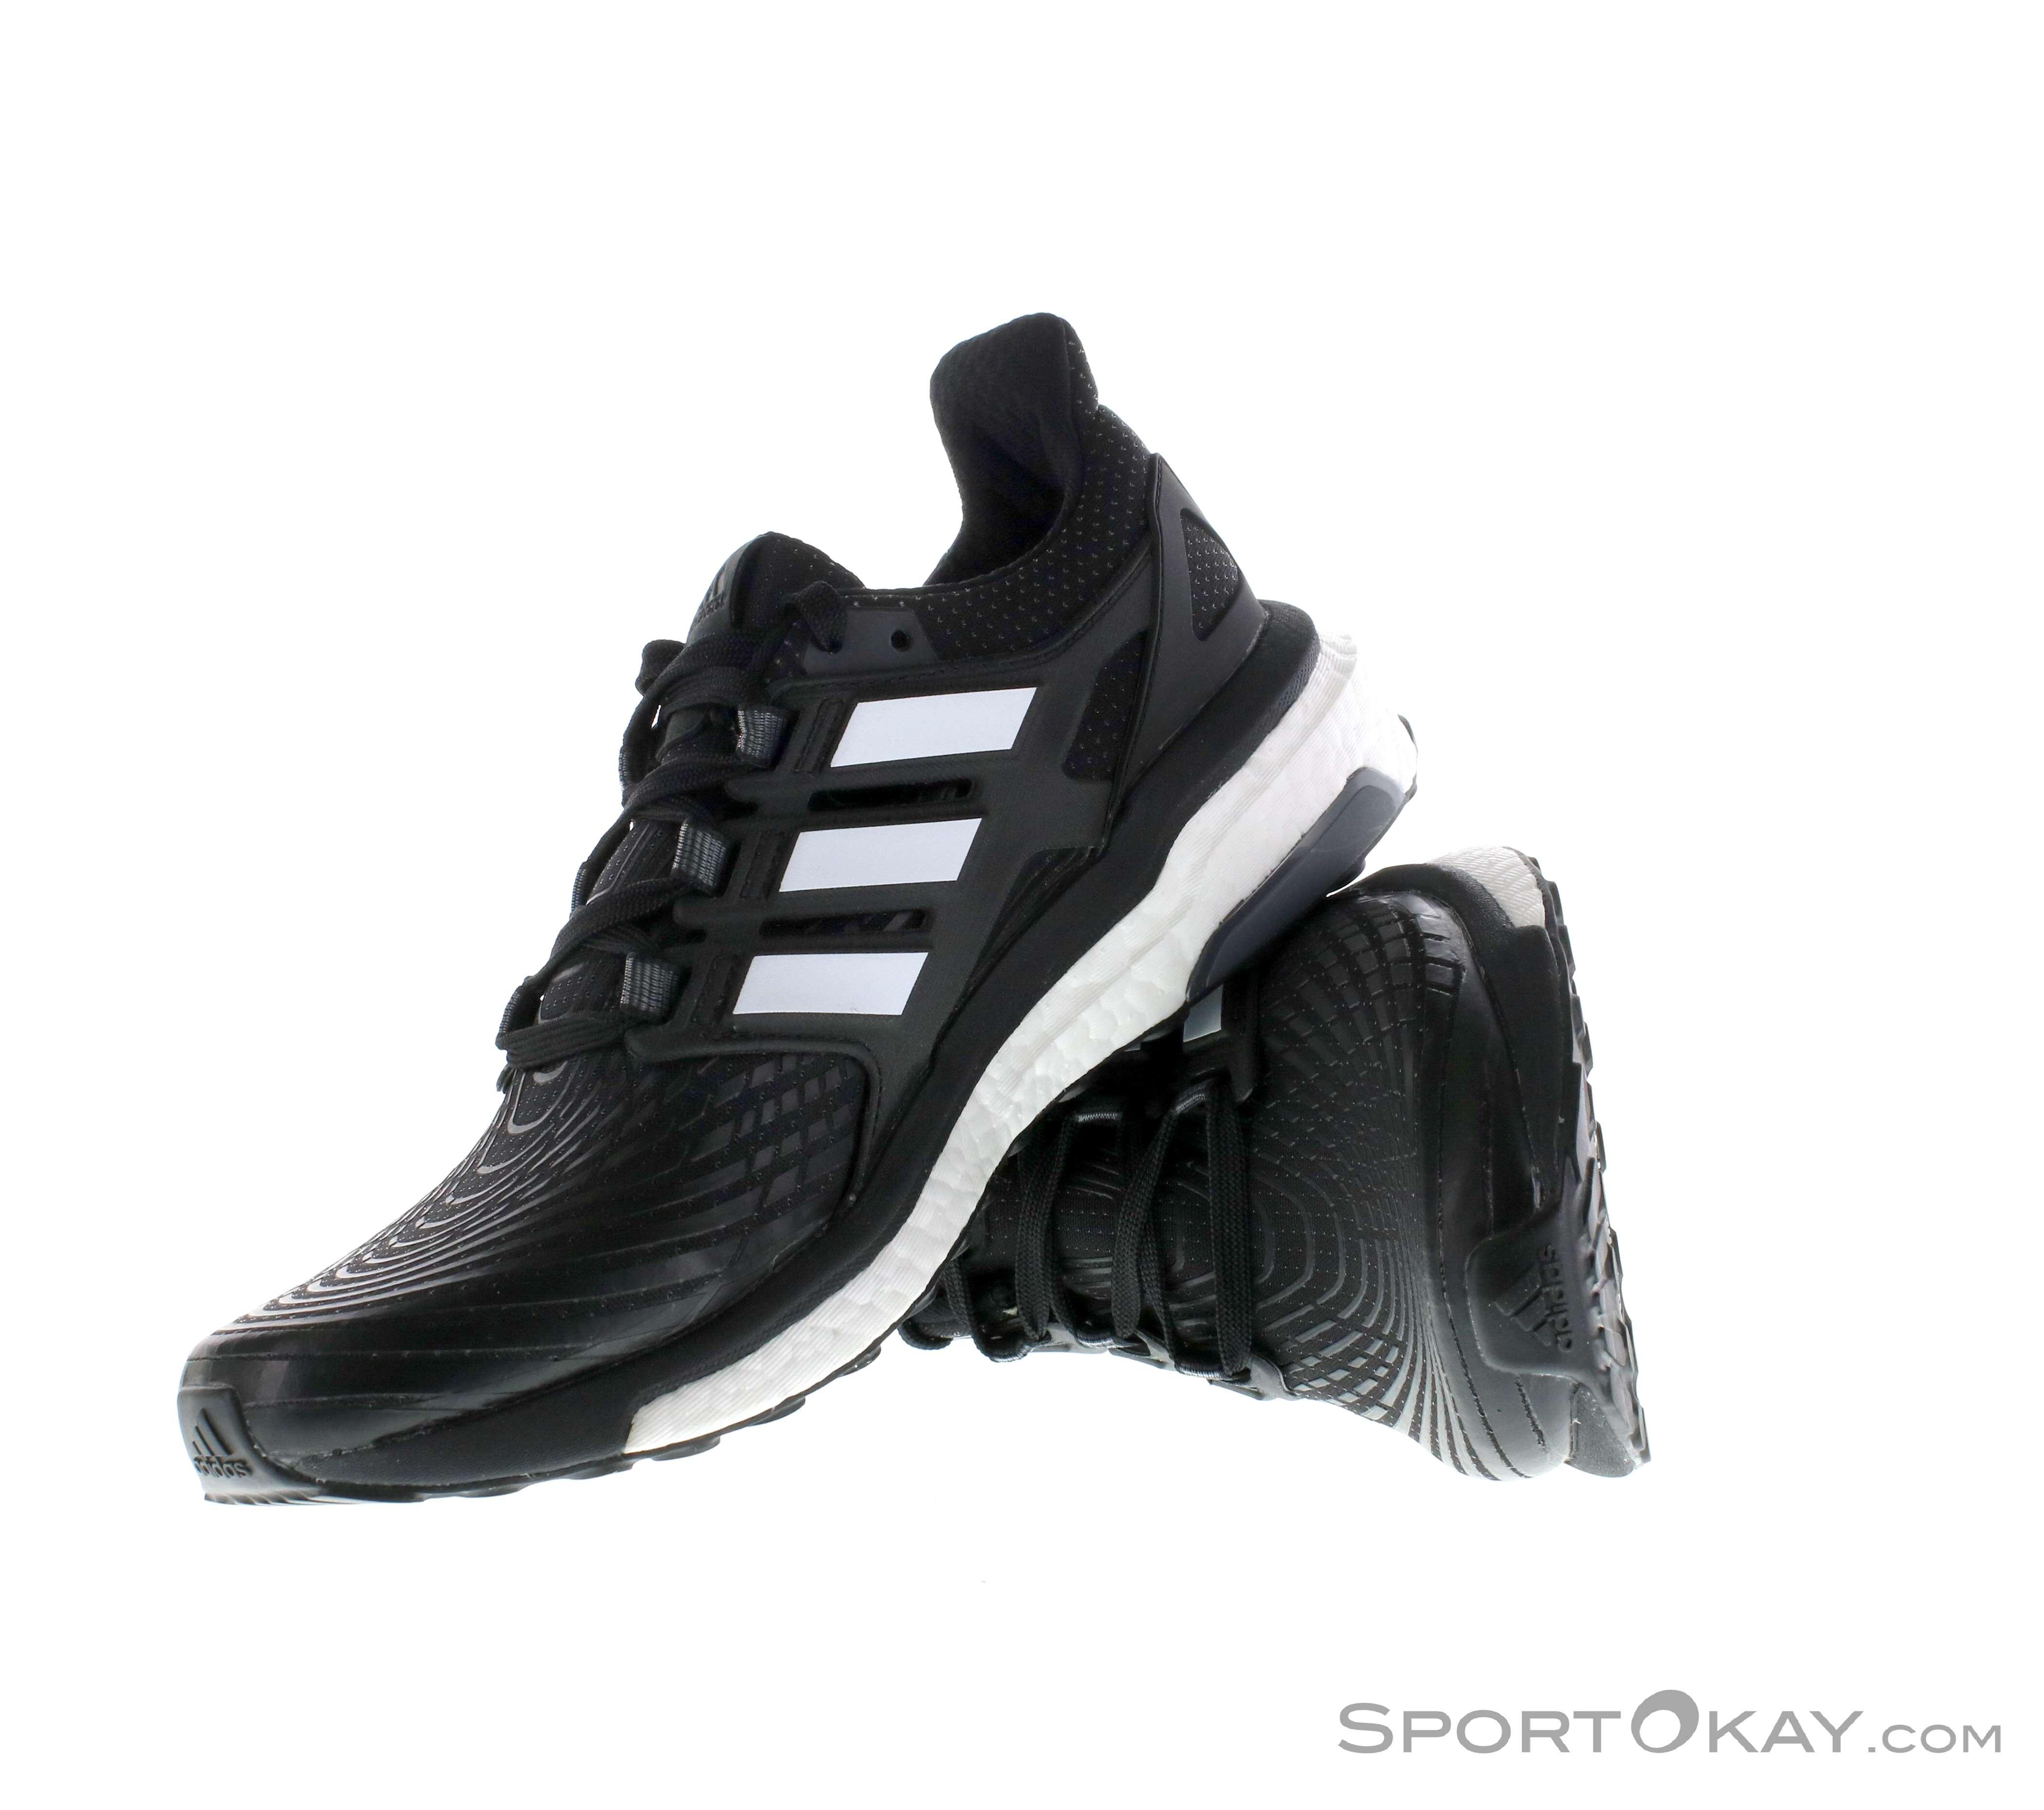 adidas energia impulso mens scarpe da corsa, corsa, da scarpe da corsa a correre 6215d6